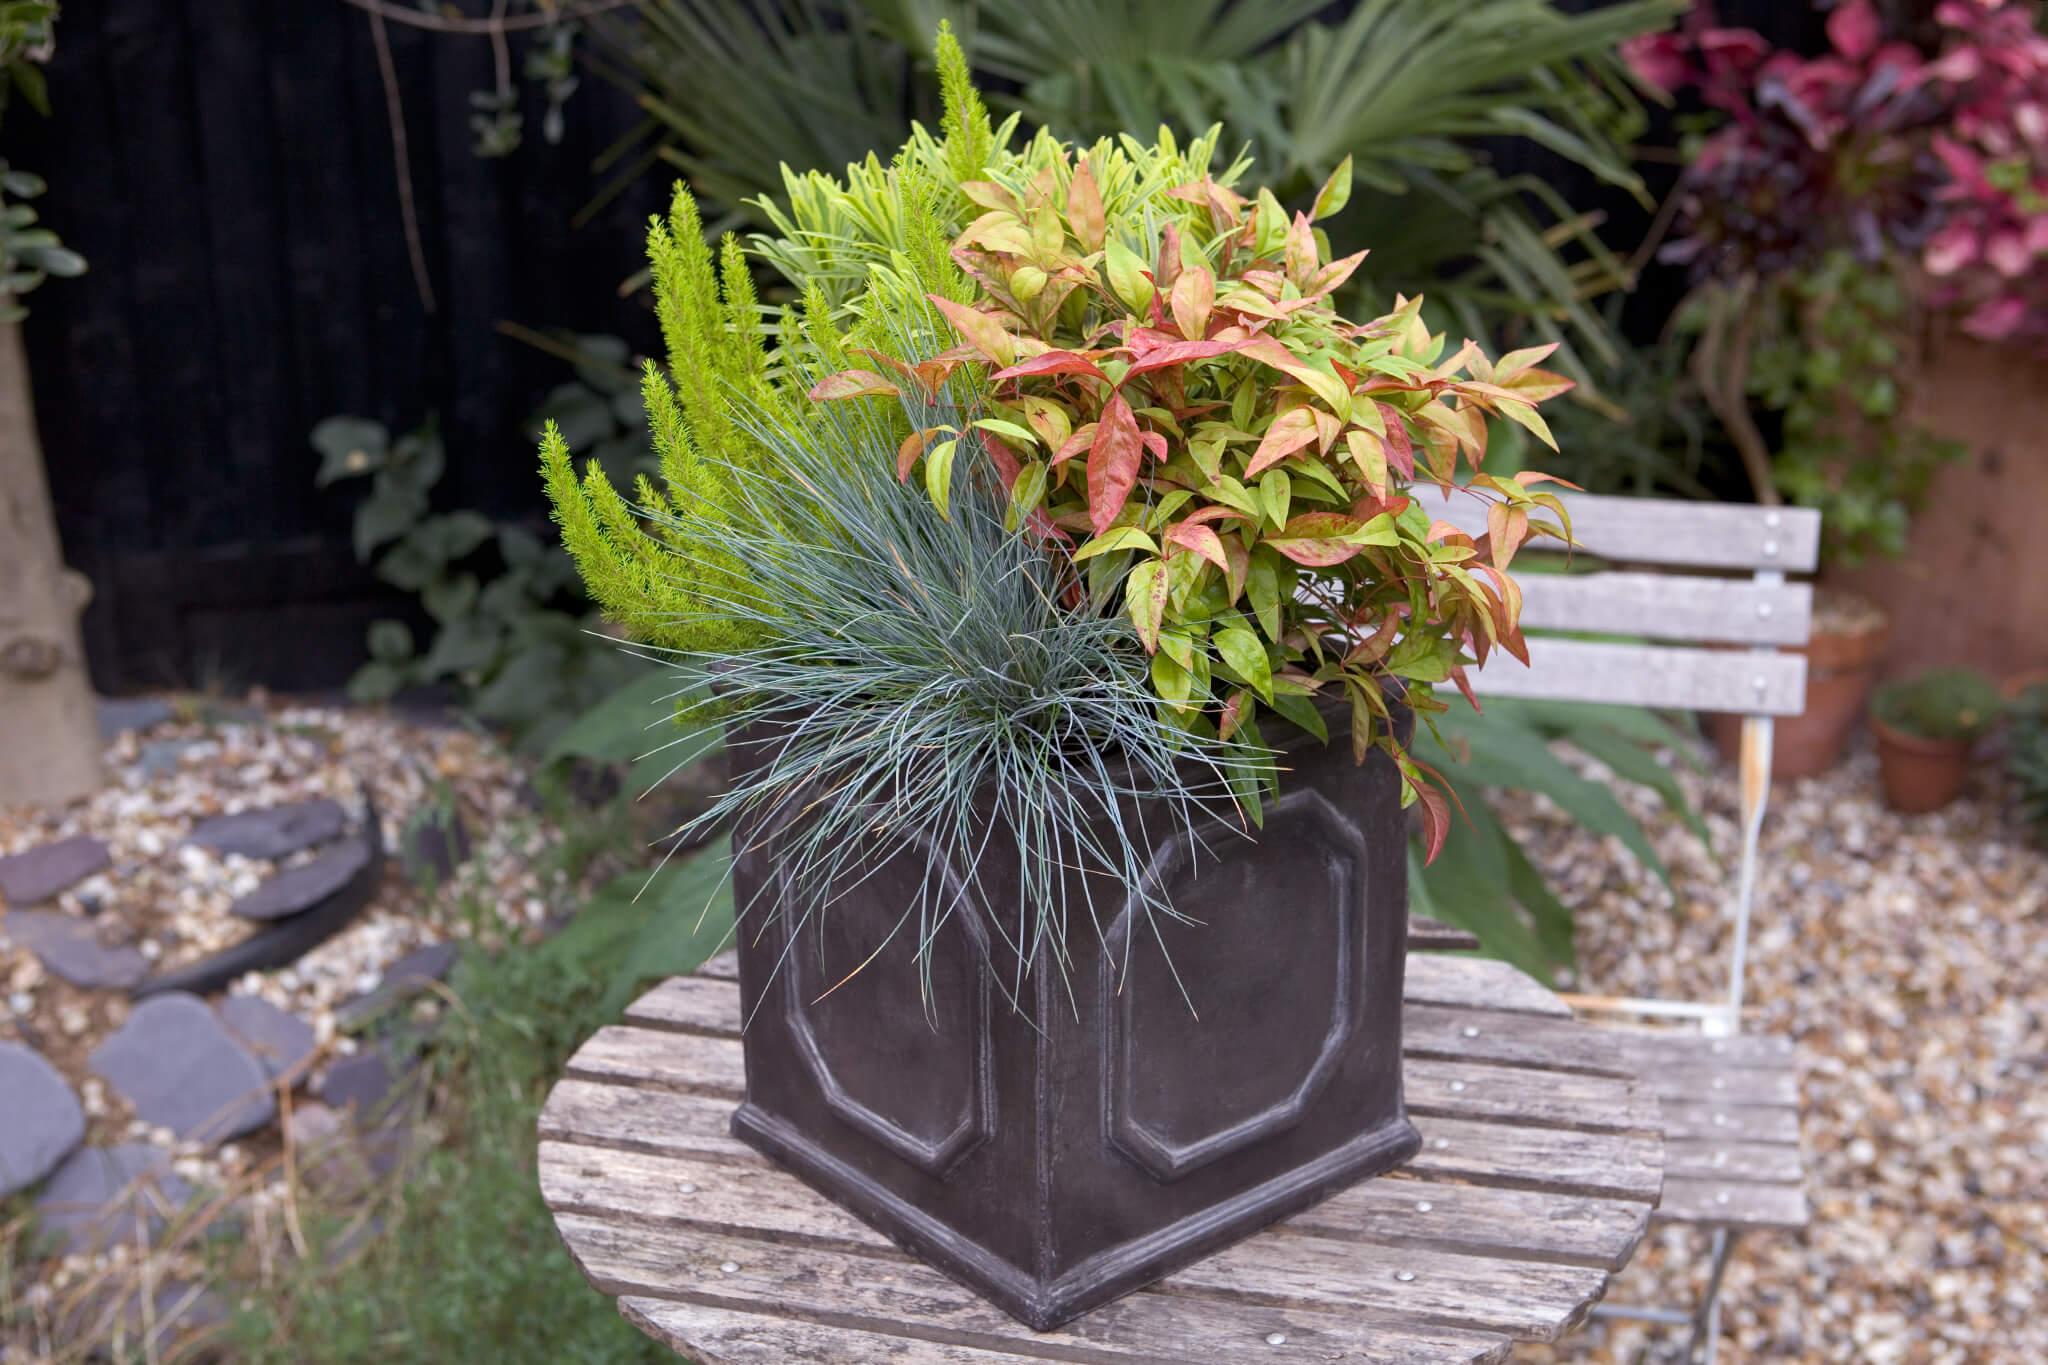 Euphorbia and lime heather